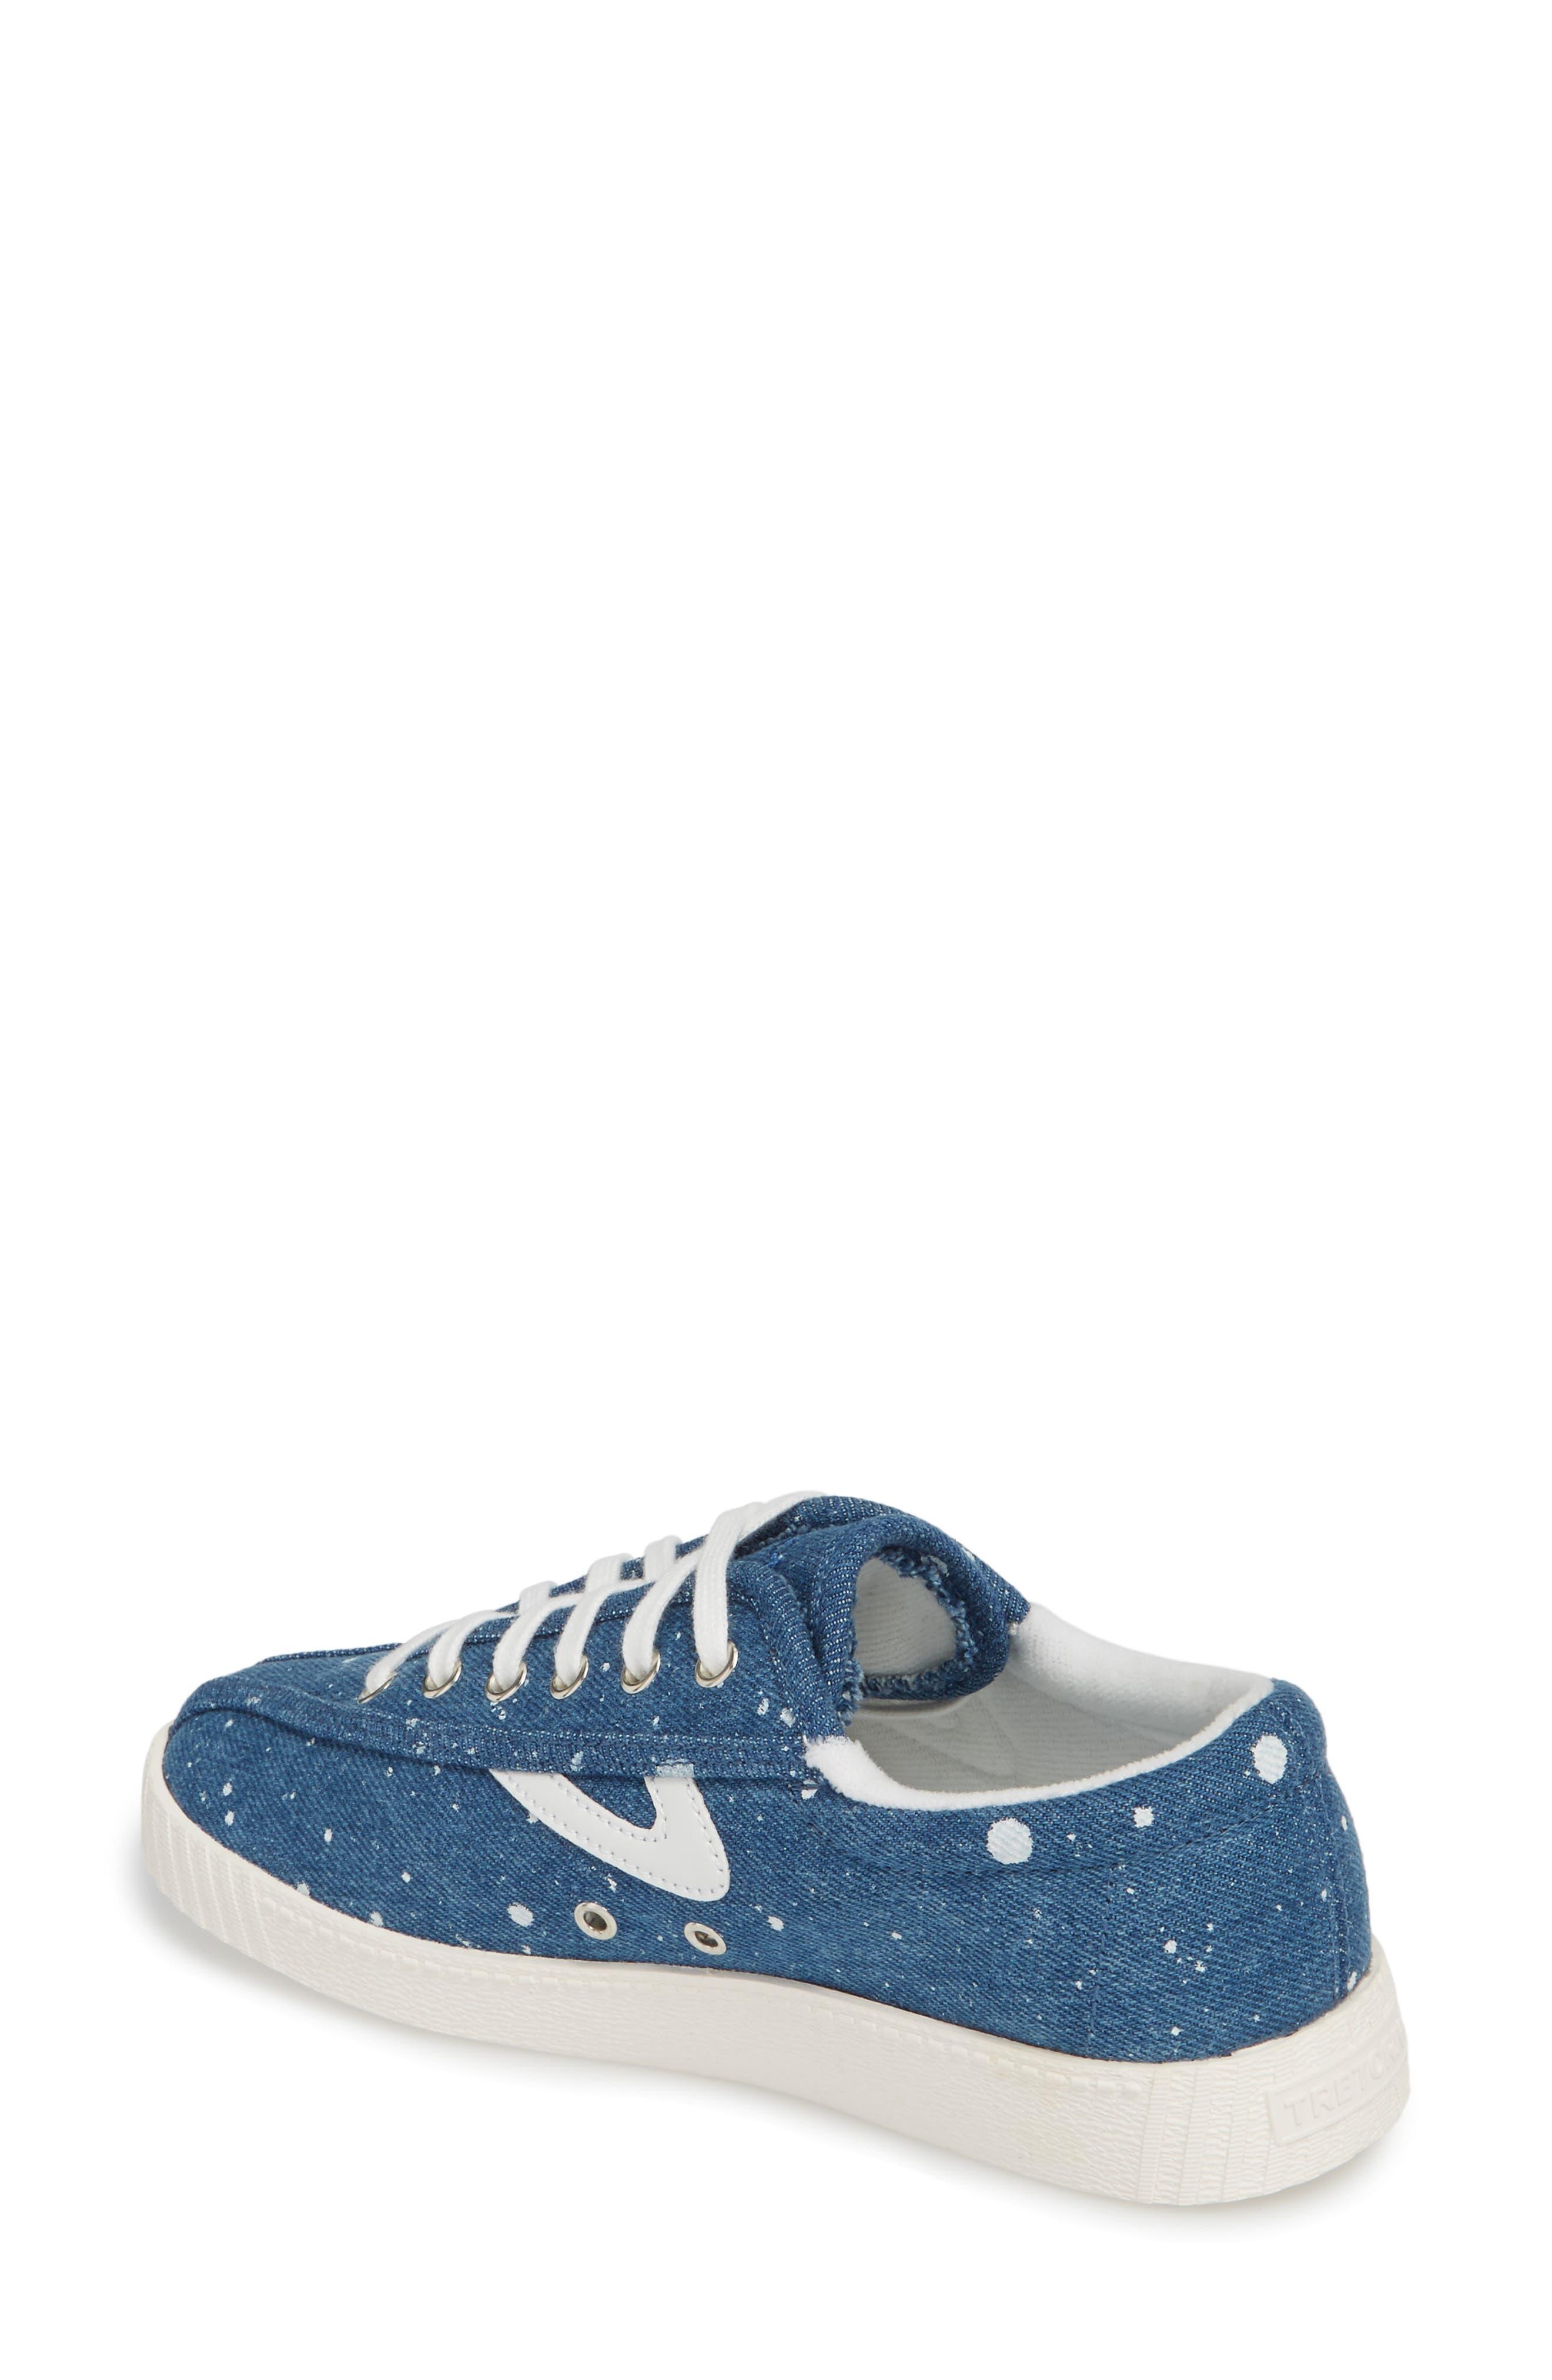 Nylite Plus Sneaker,                             Alternate thumbnail 2, color,                             Blue Fabric